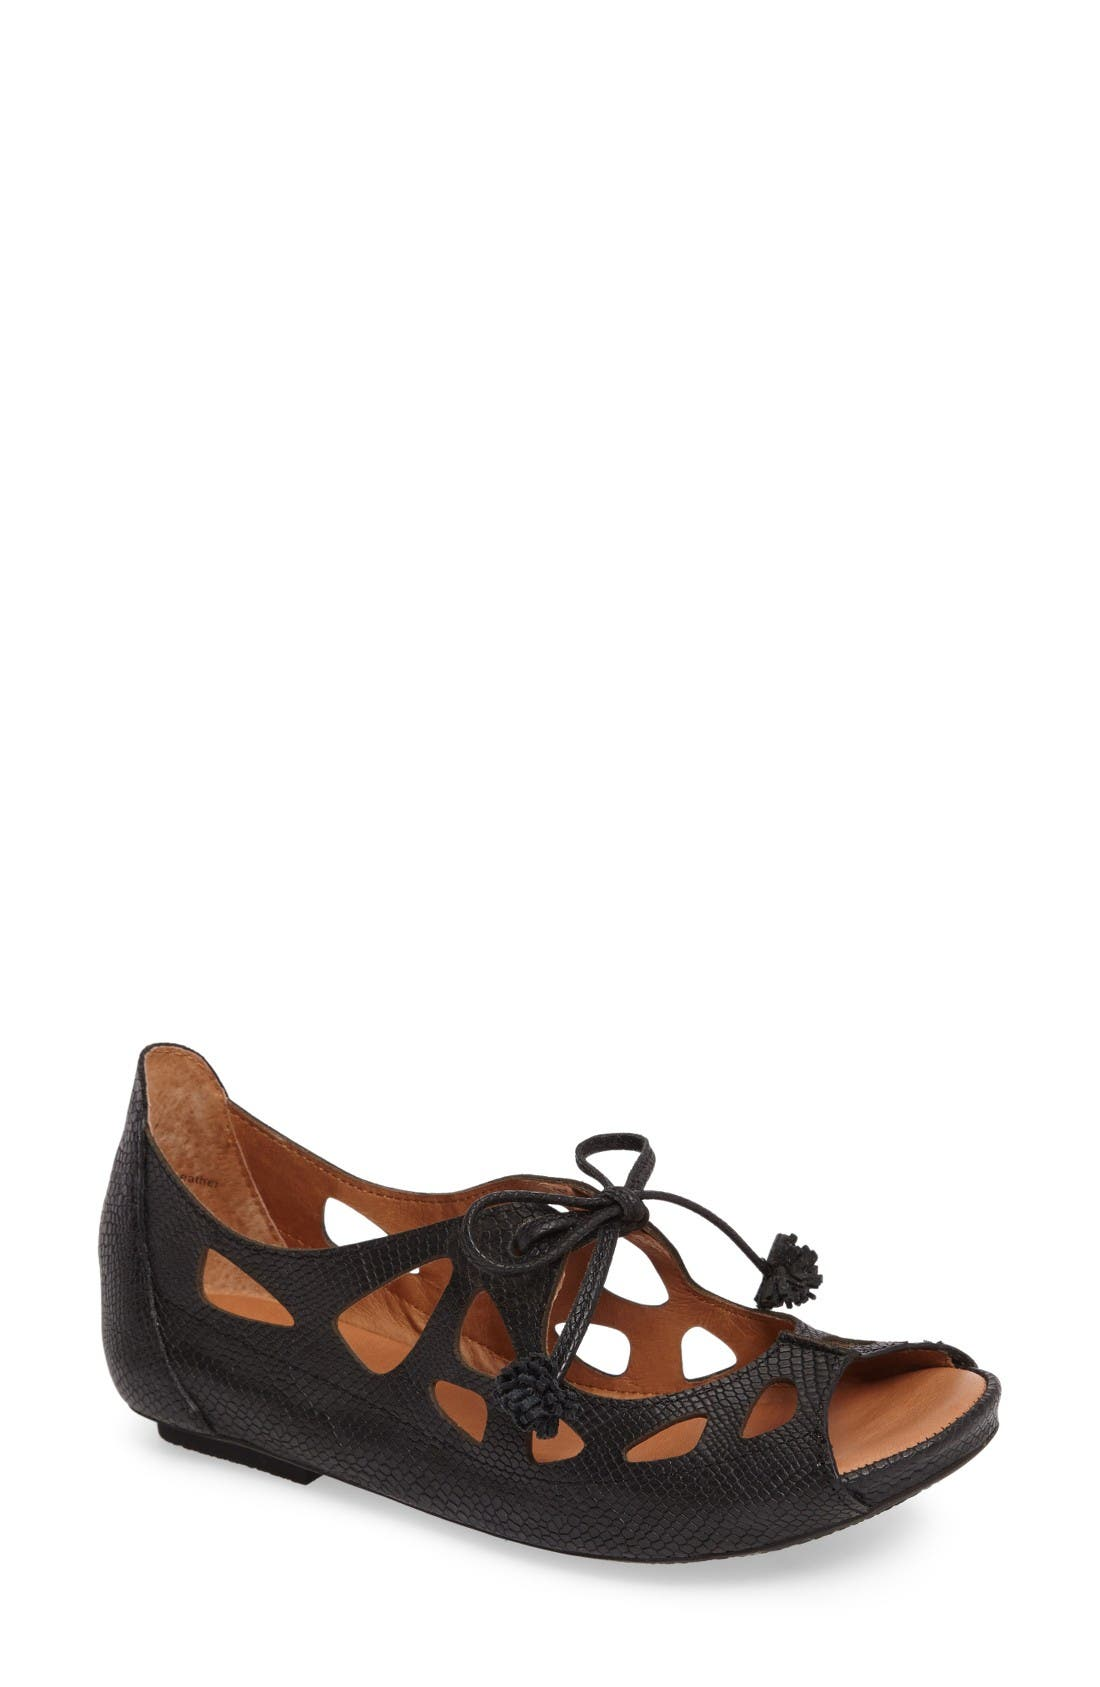 GENTLE SOULS Brynn Cutout Sandal